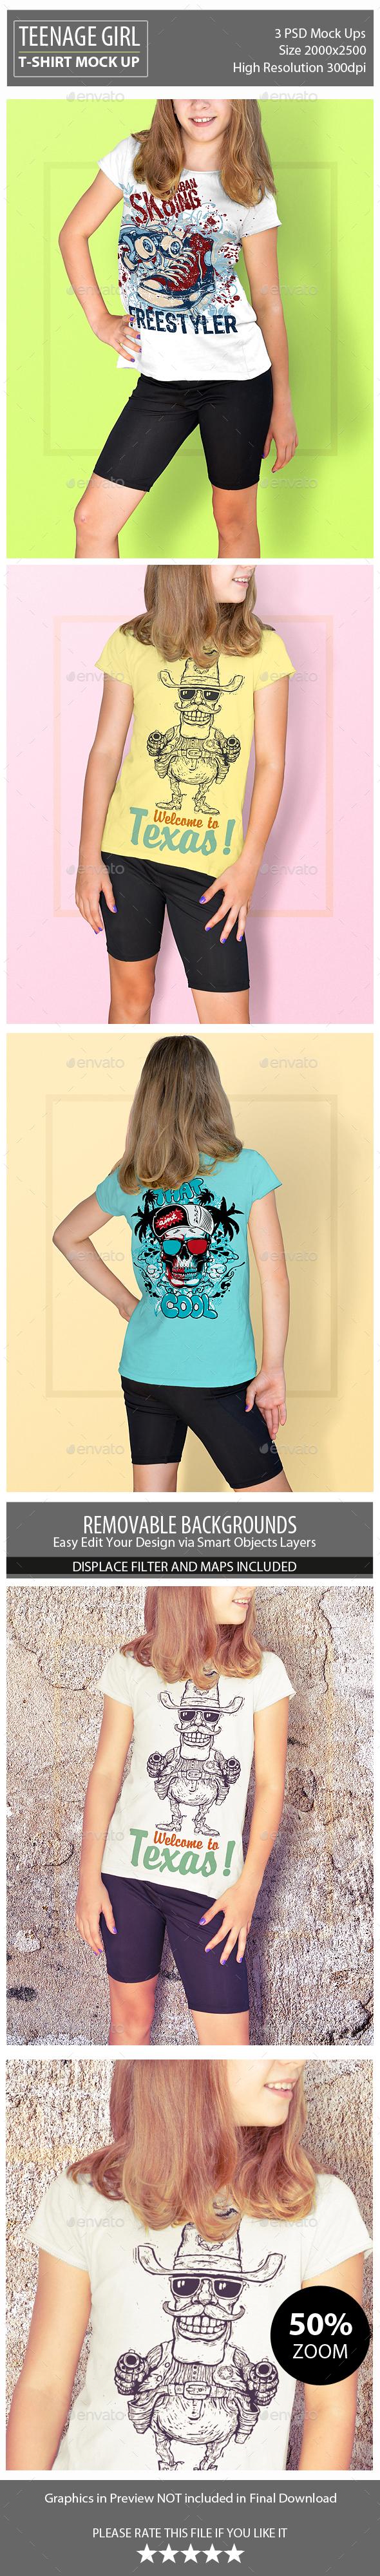 Teenage Girl T-Shirt Mock Up